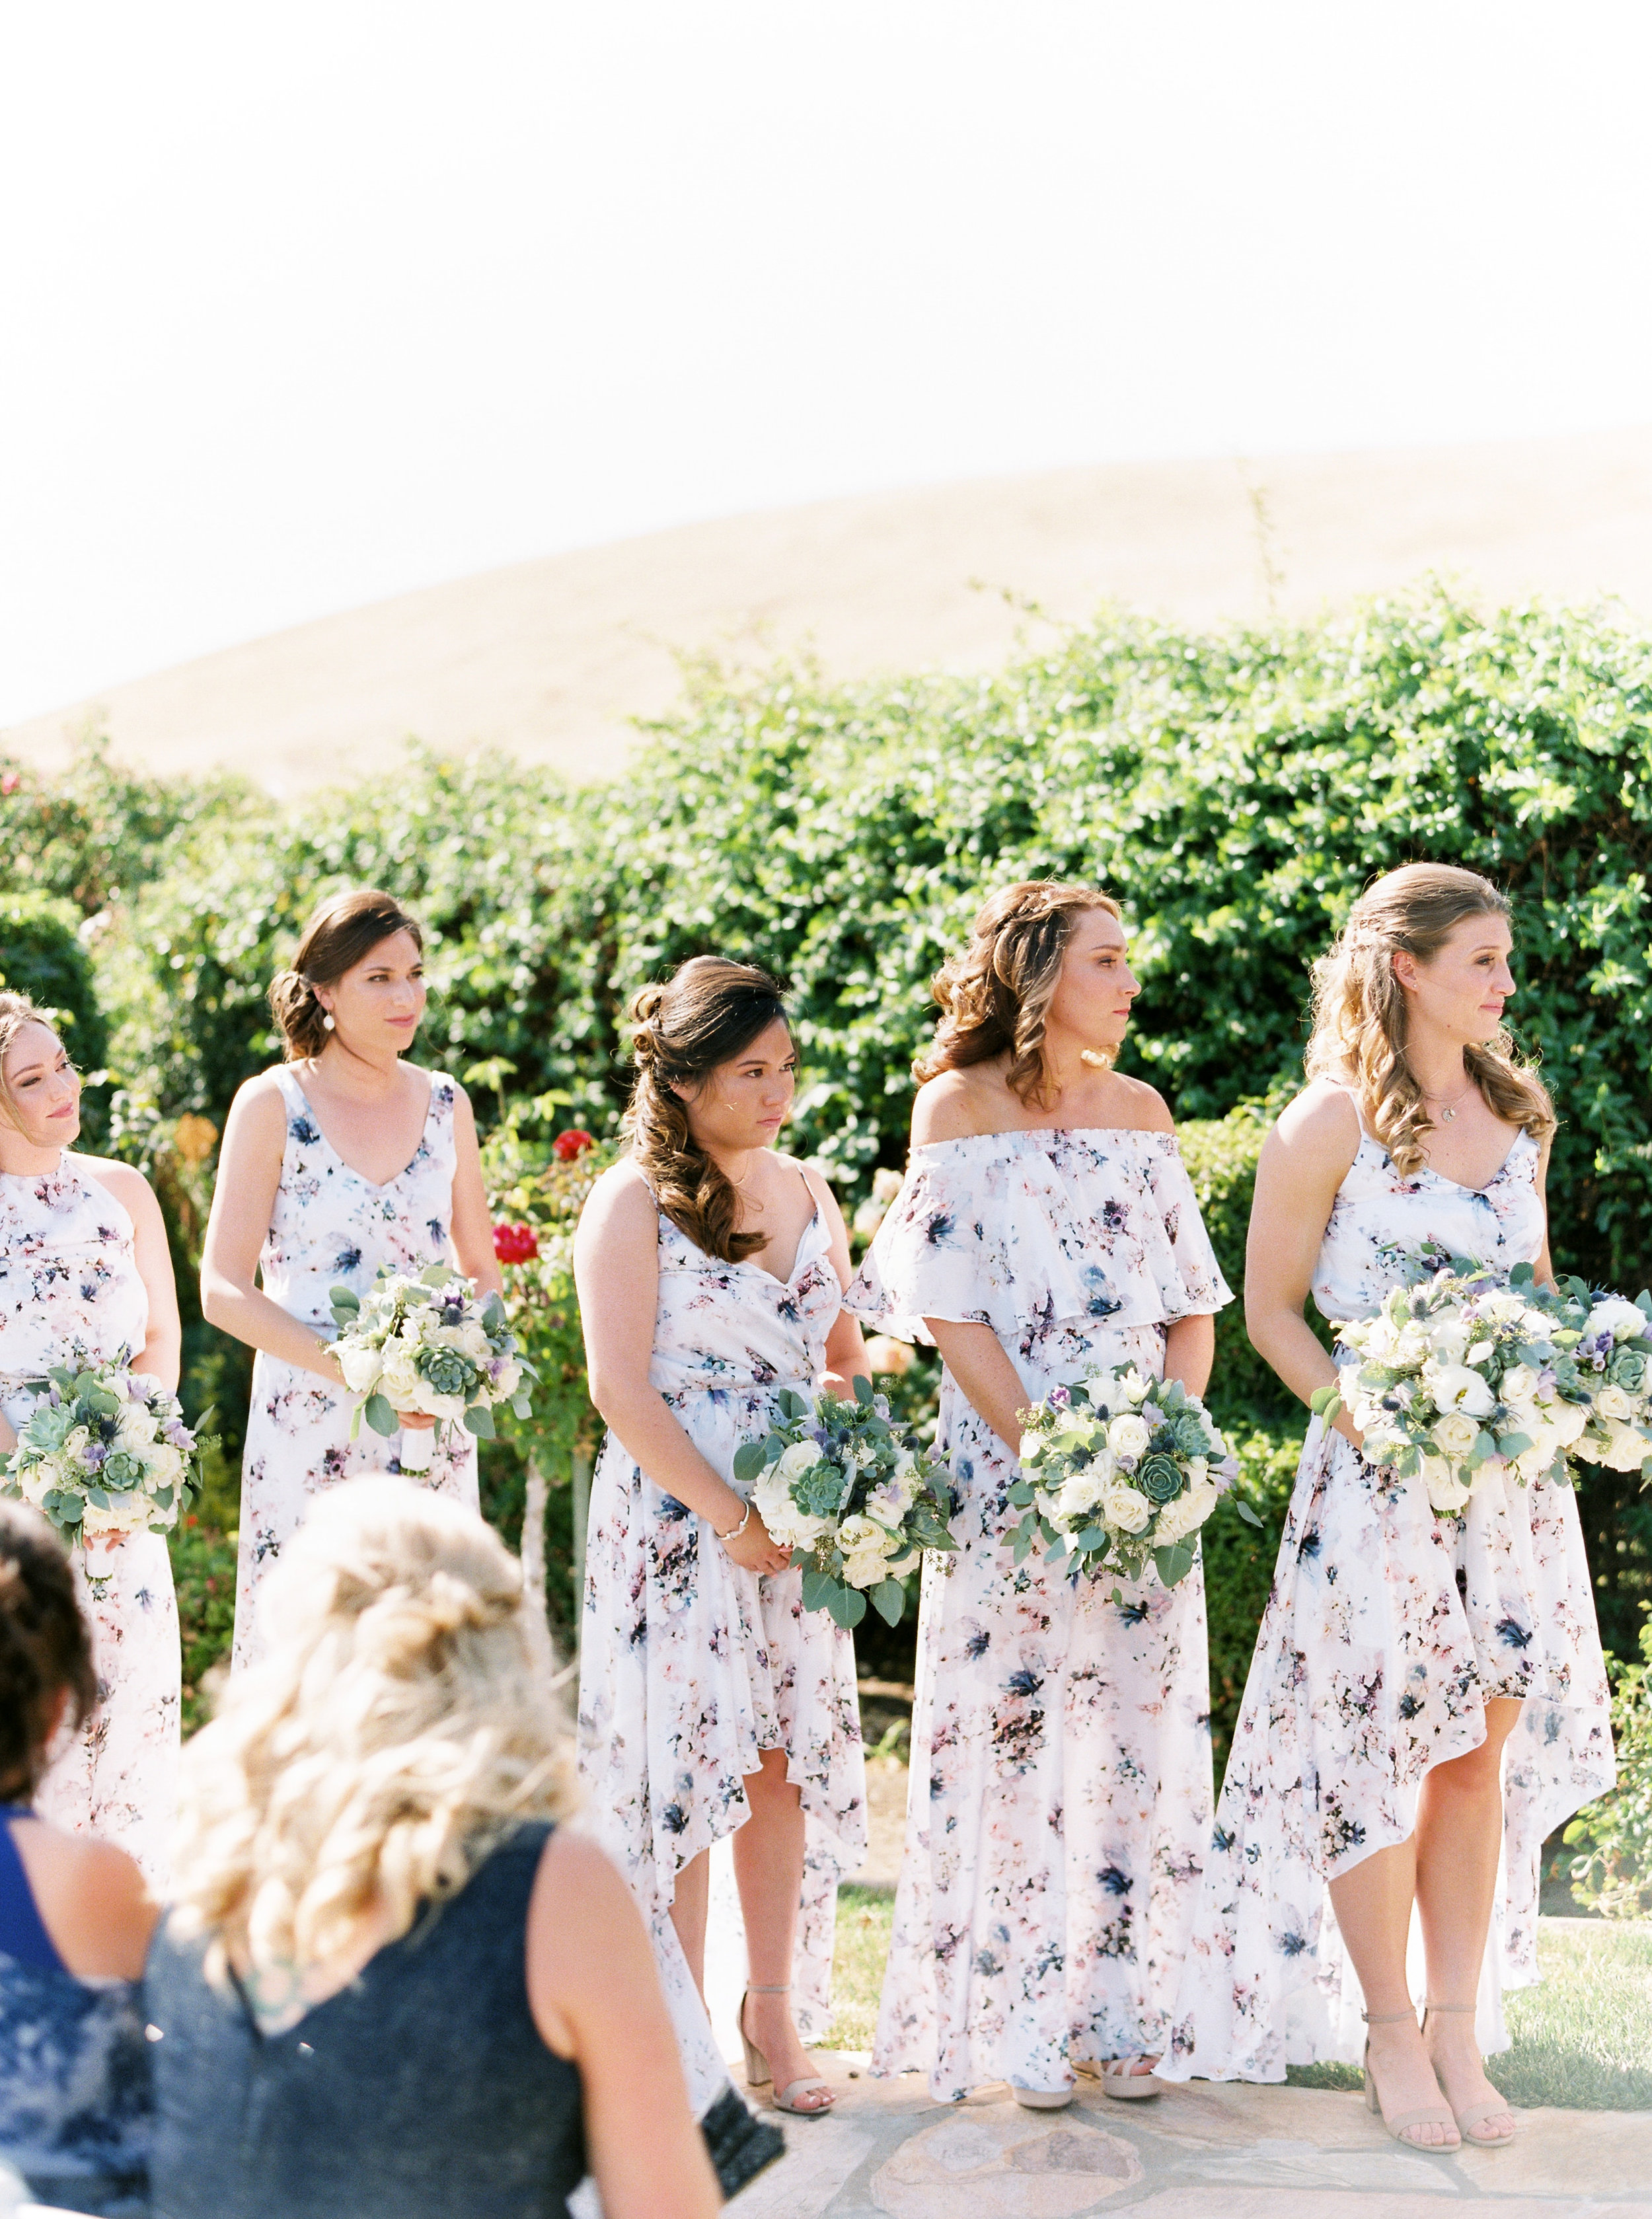 the-purple-orchid-resort-wedding-in-livermore-california-160.jpg